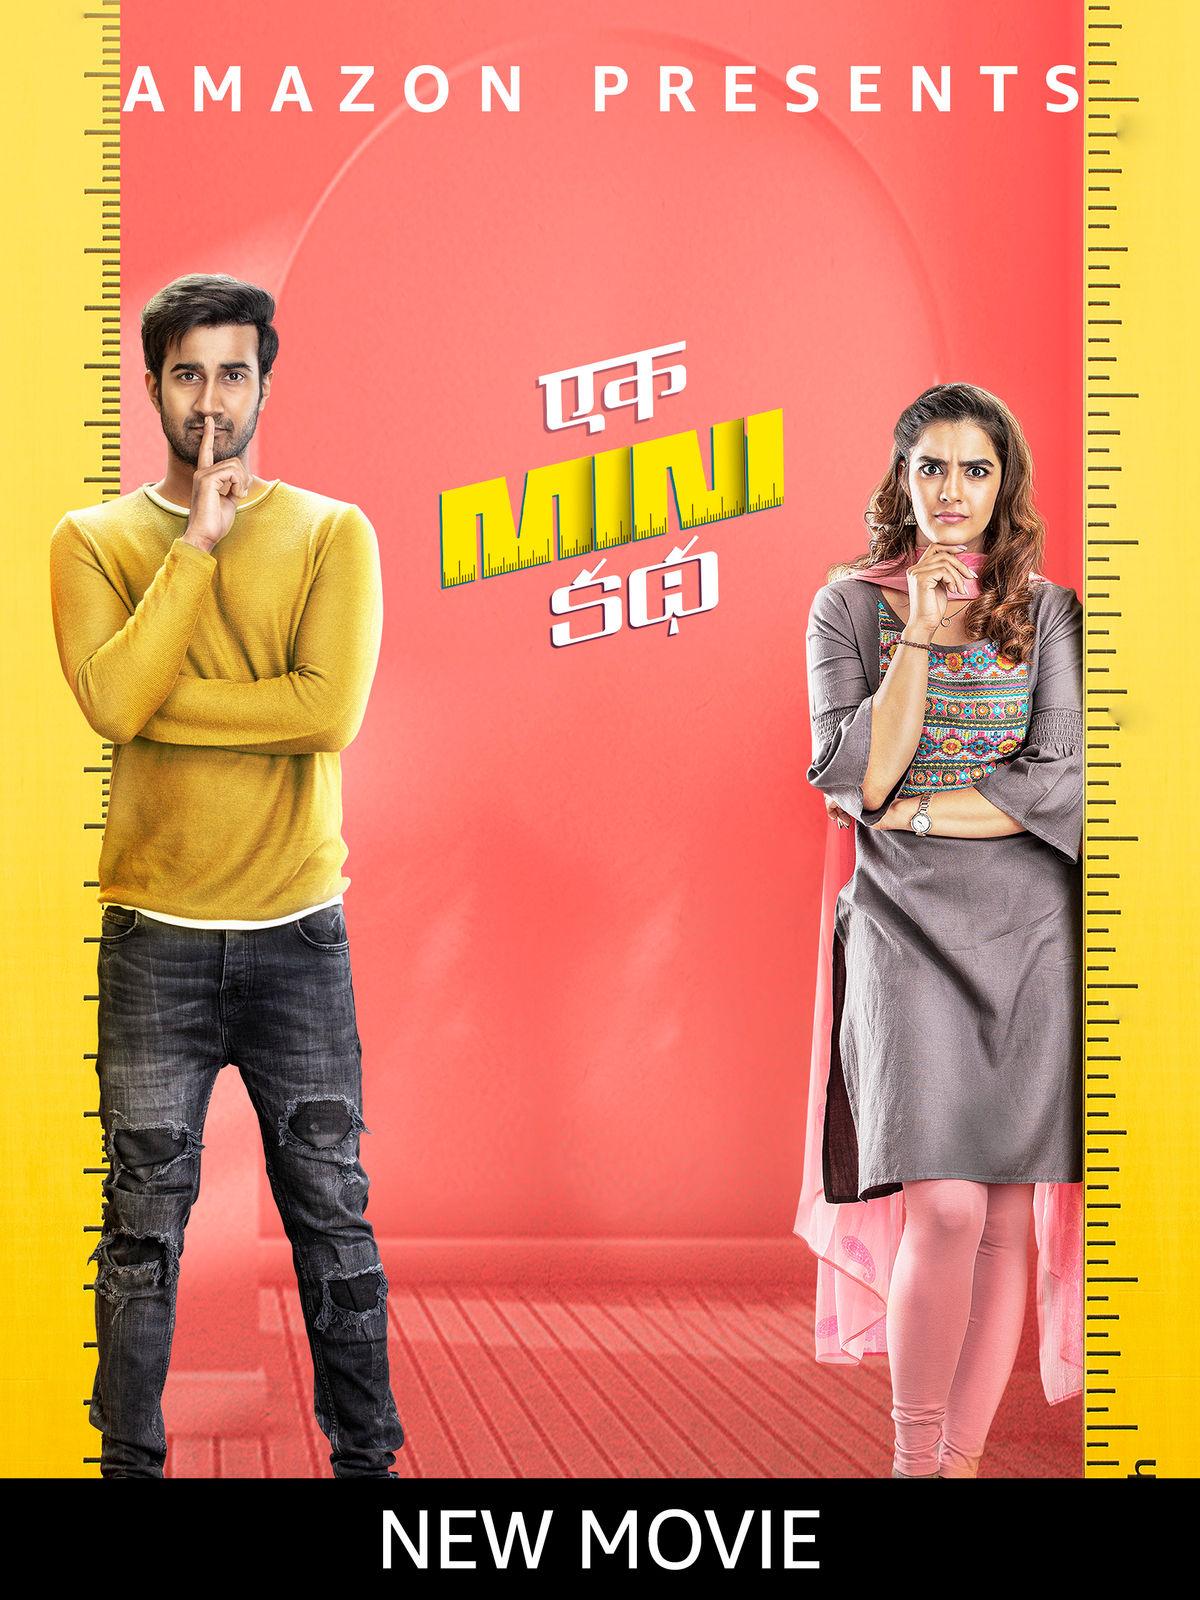 Kavya Thapar Best Movies, TV Shows and Web Series List